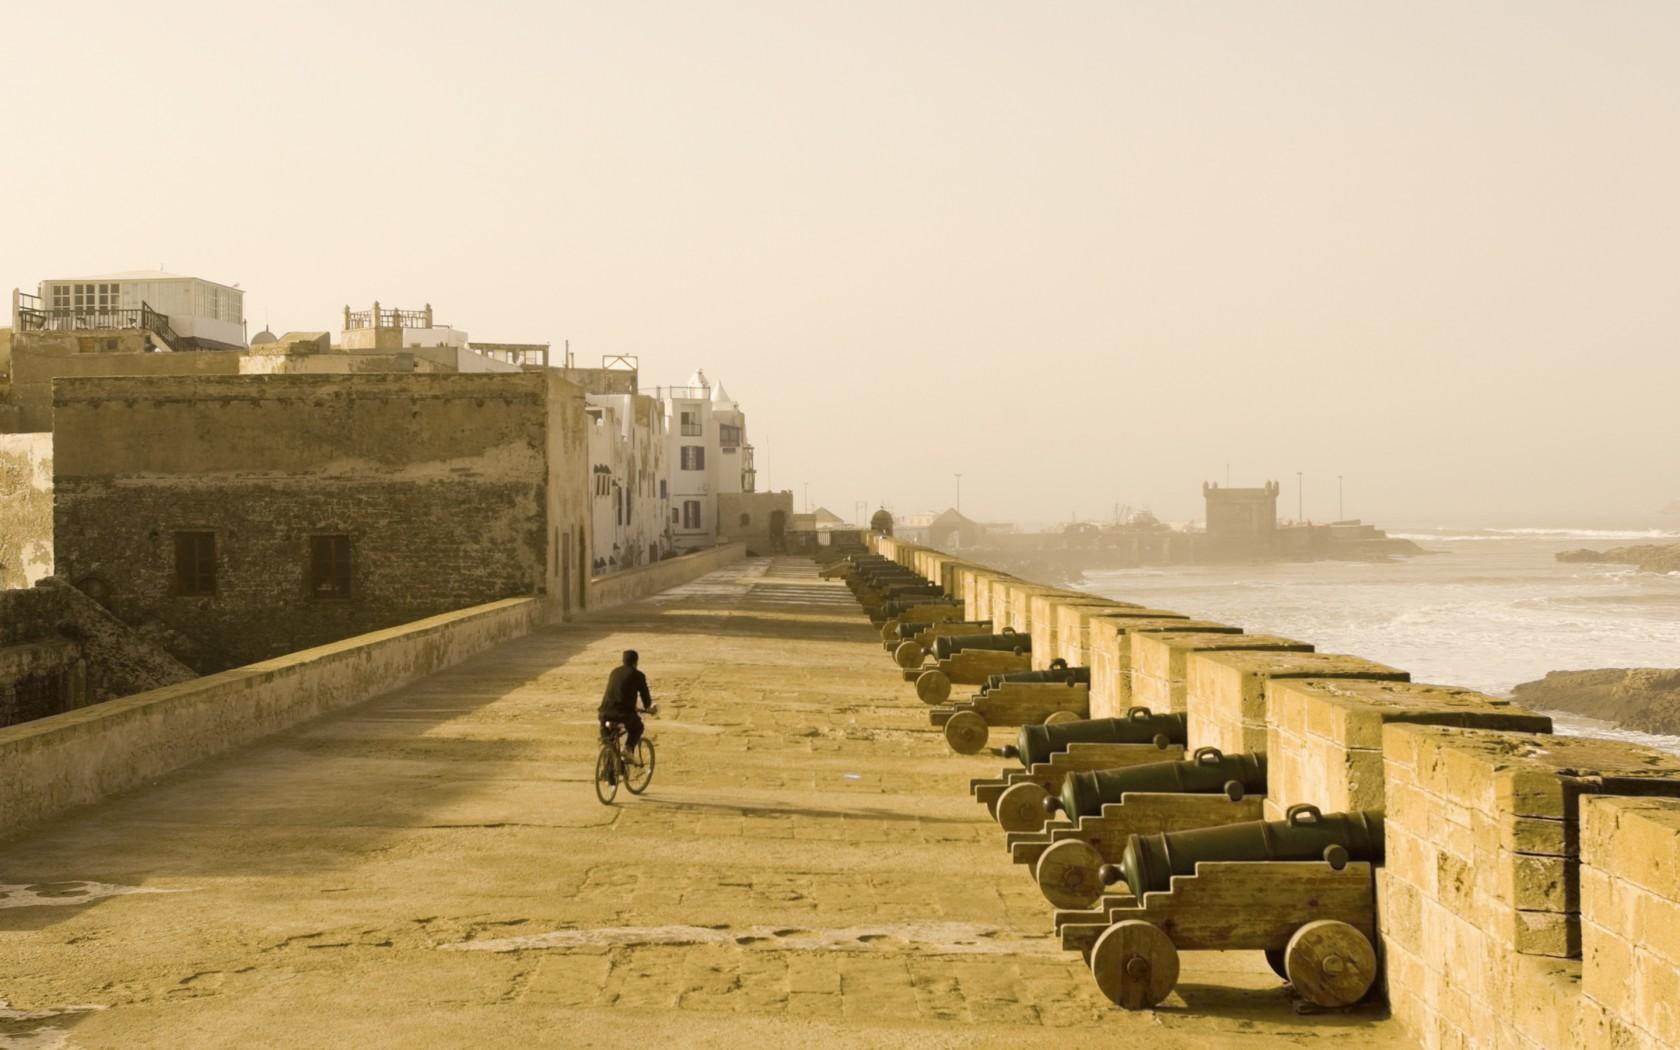 Game of Thrones Filming Location - Essaouira, Morroco